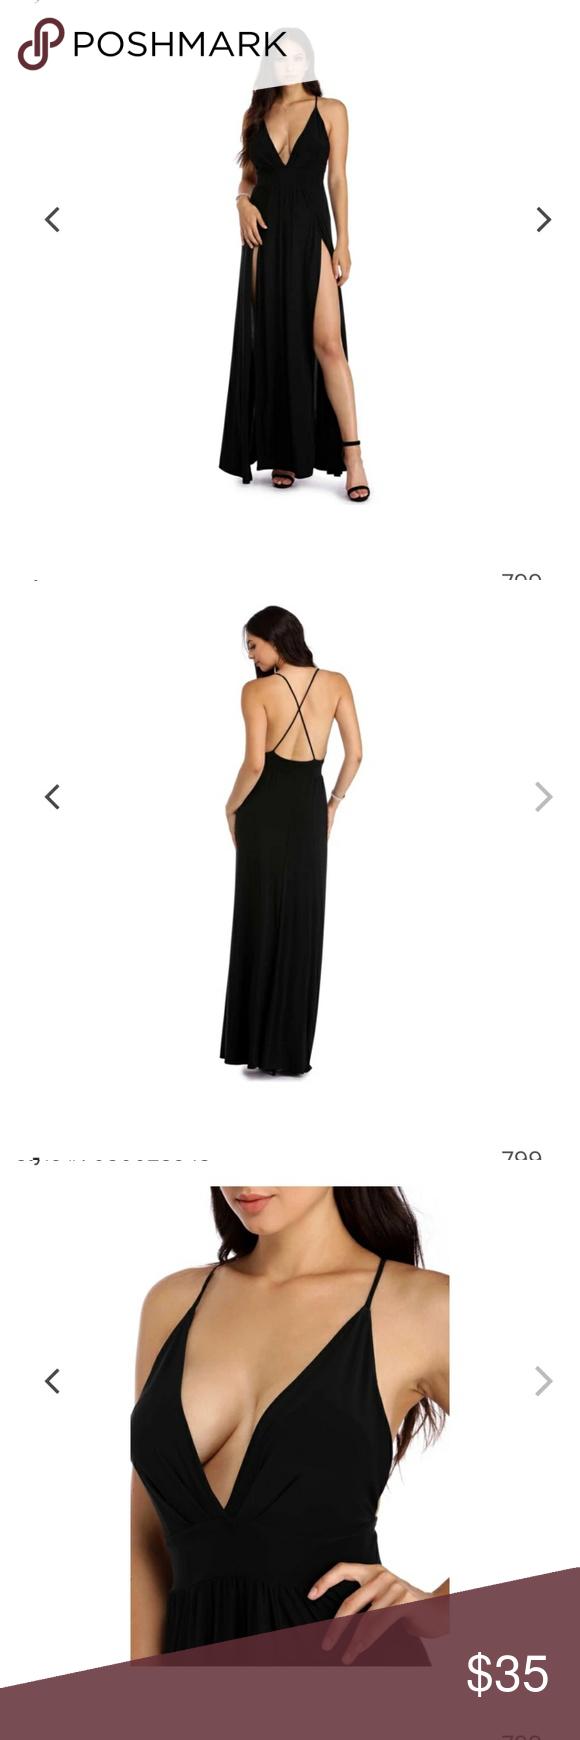 Backless Dress Long Black Dress Dresses Clothes Design [ 1740 x 580 Pixel ]